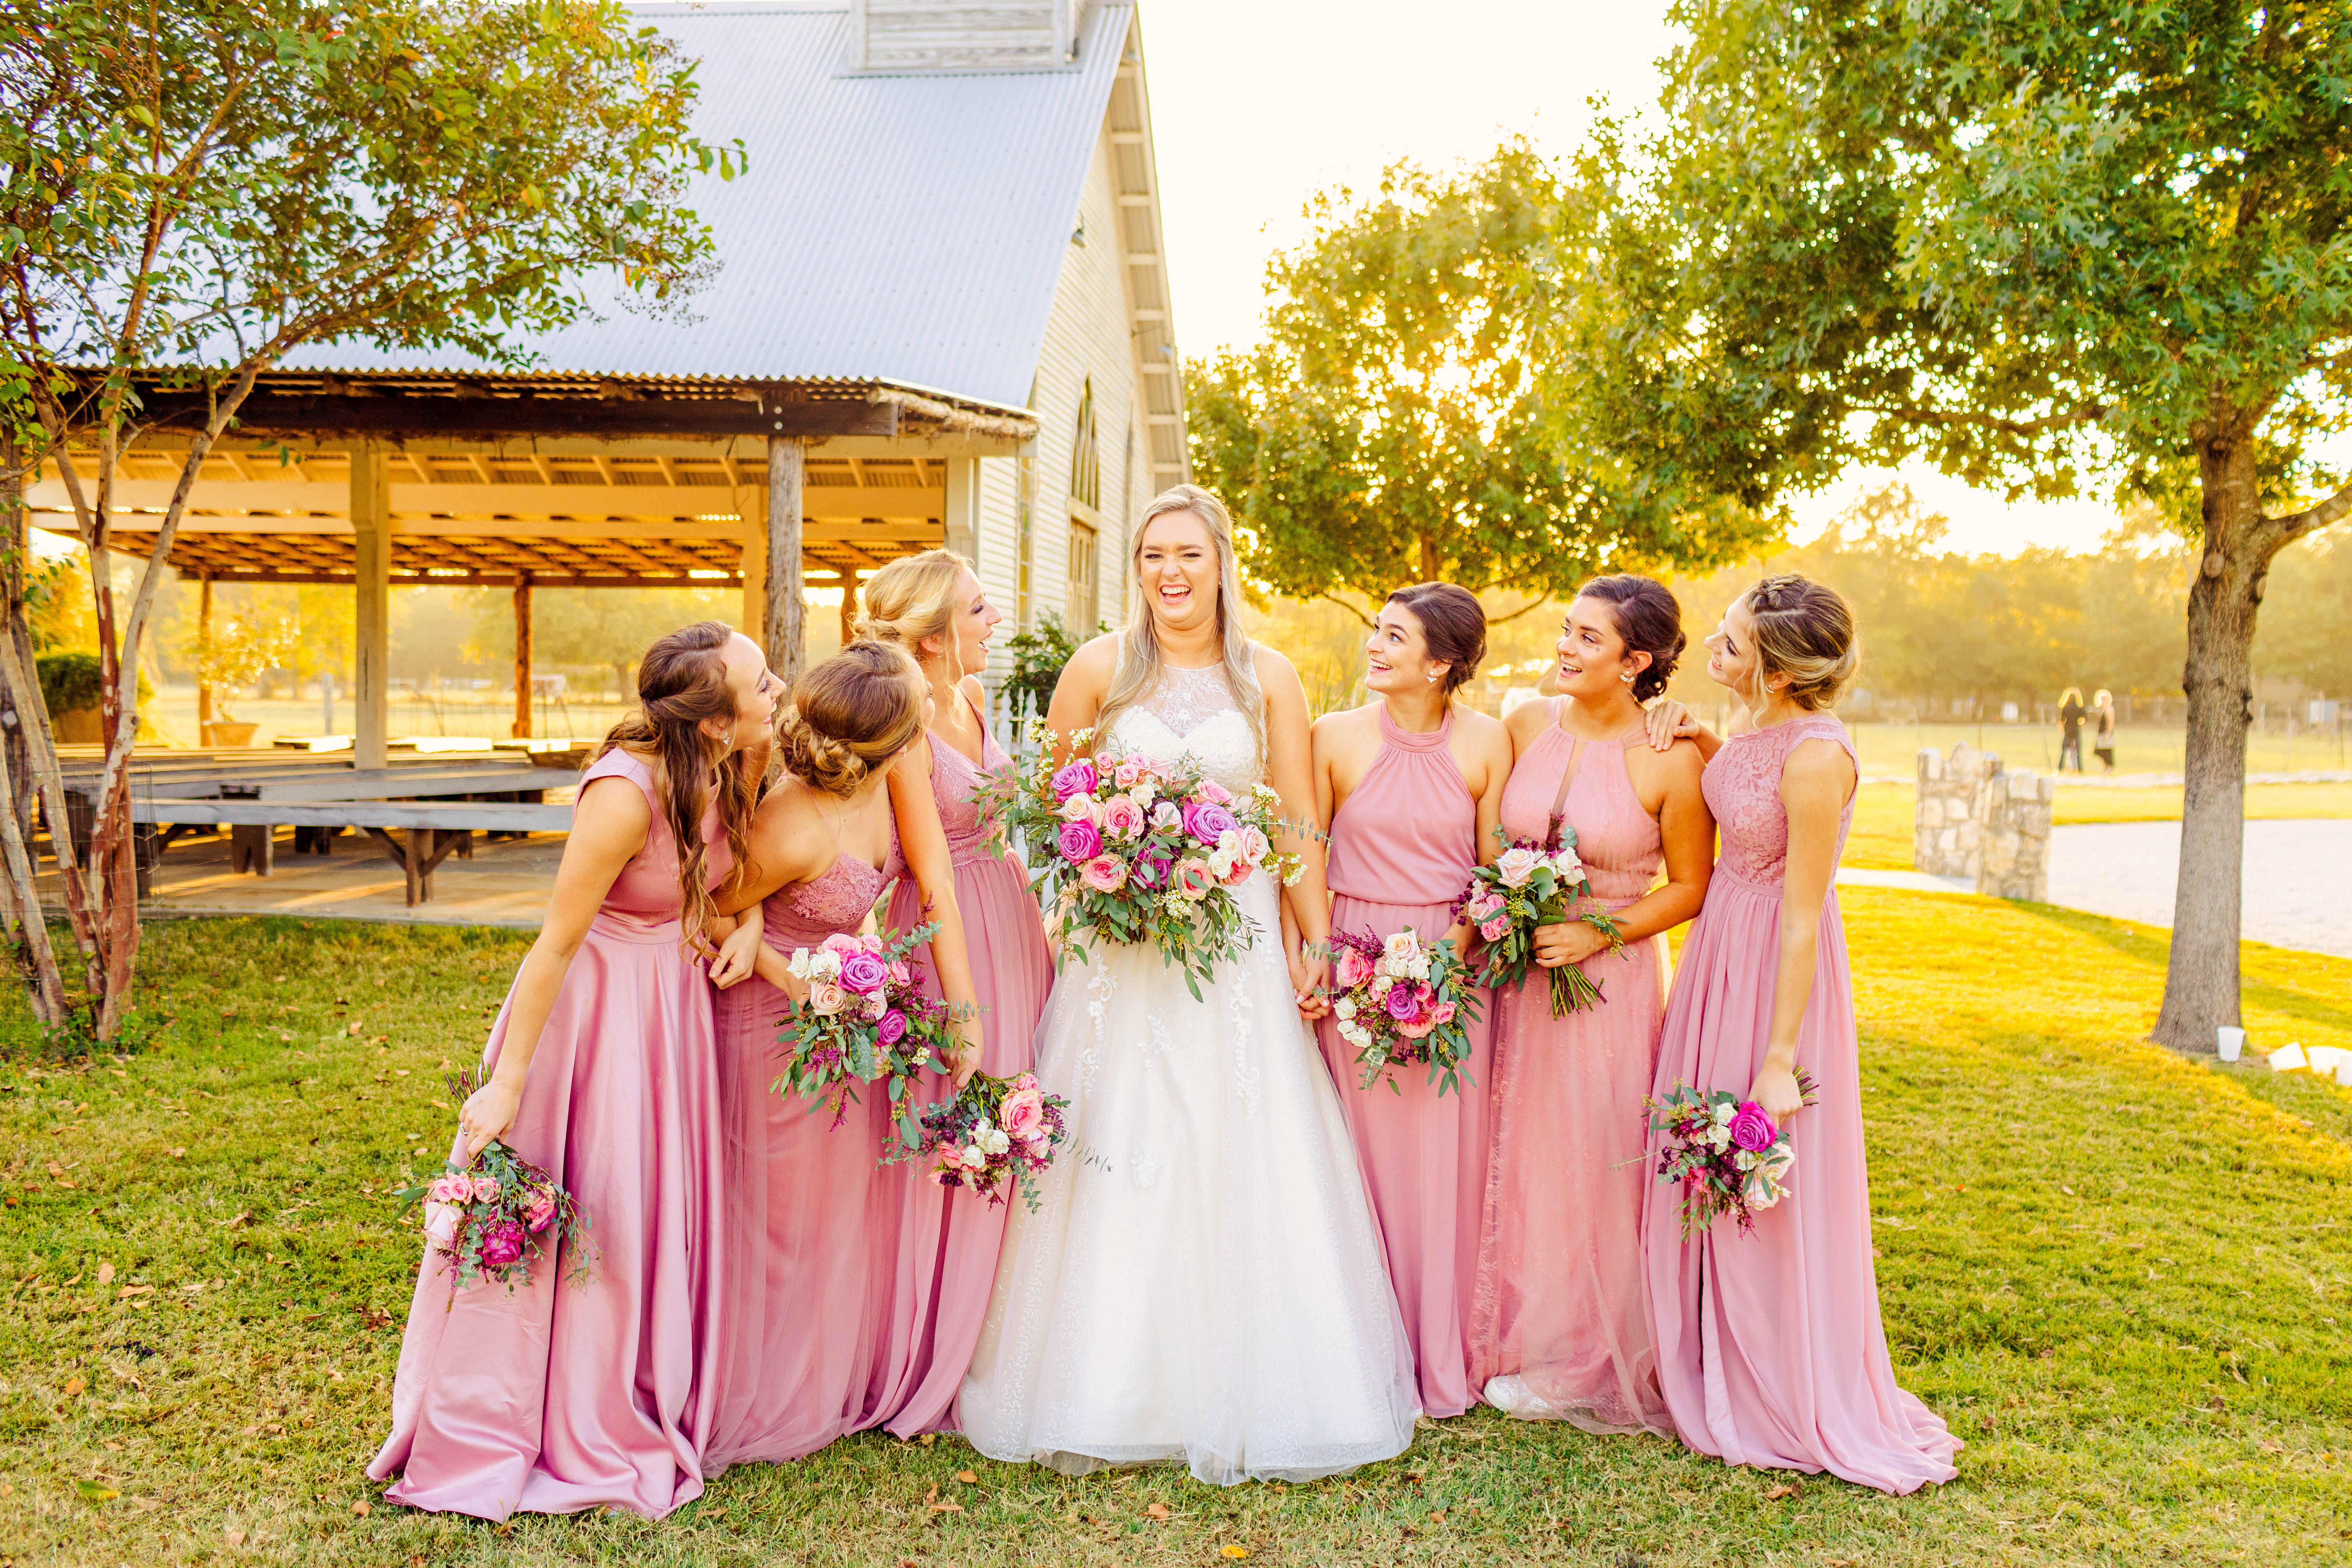 Madison's bridesmaids